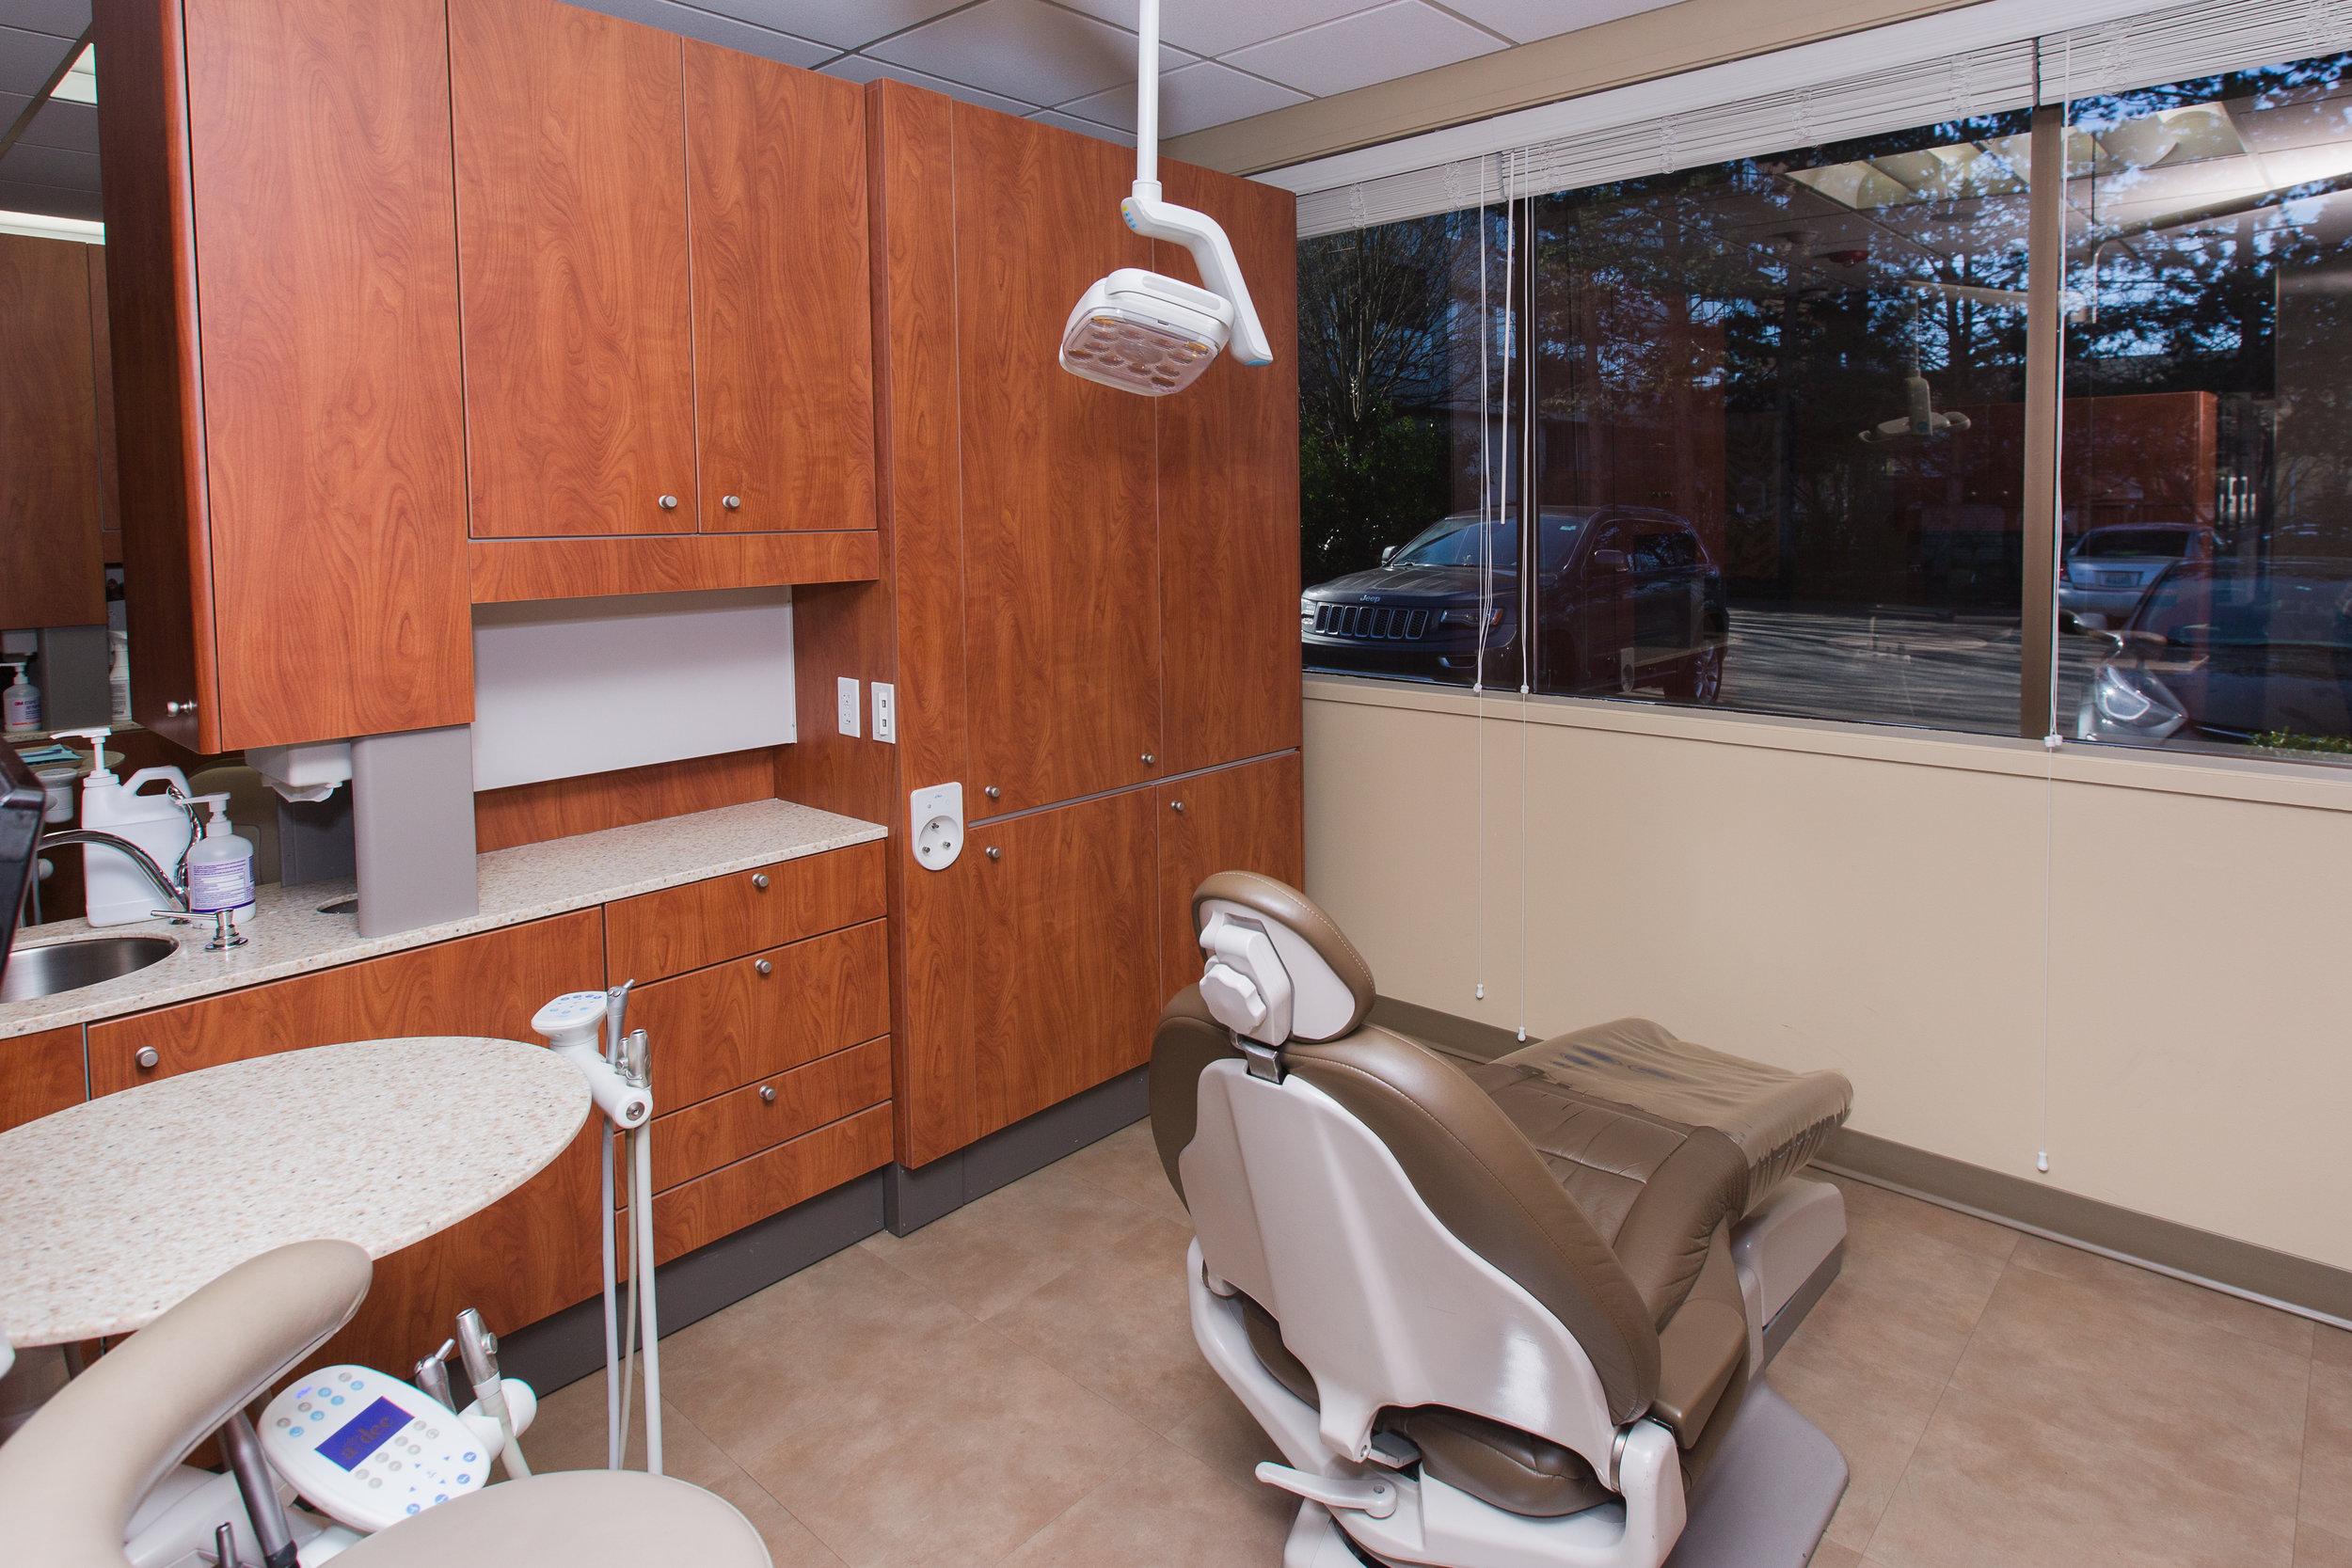 Redmond Parc Dental_22.jpg